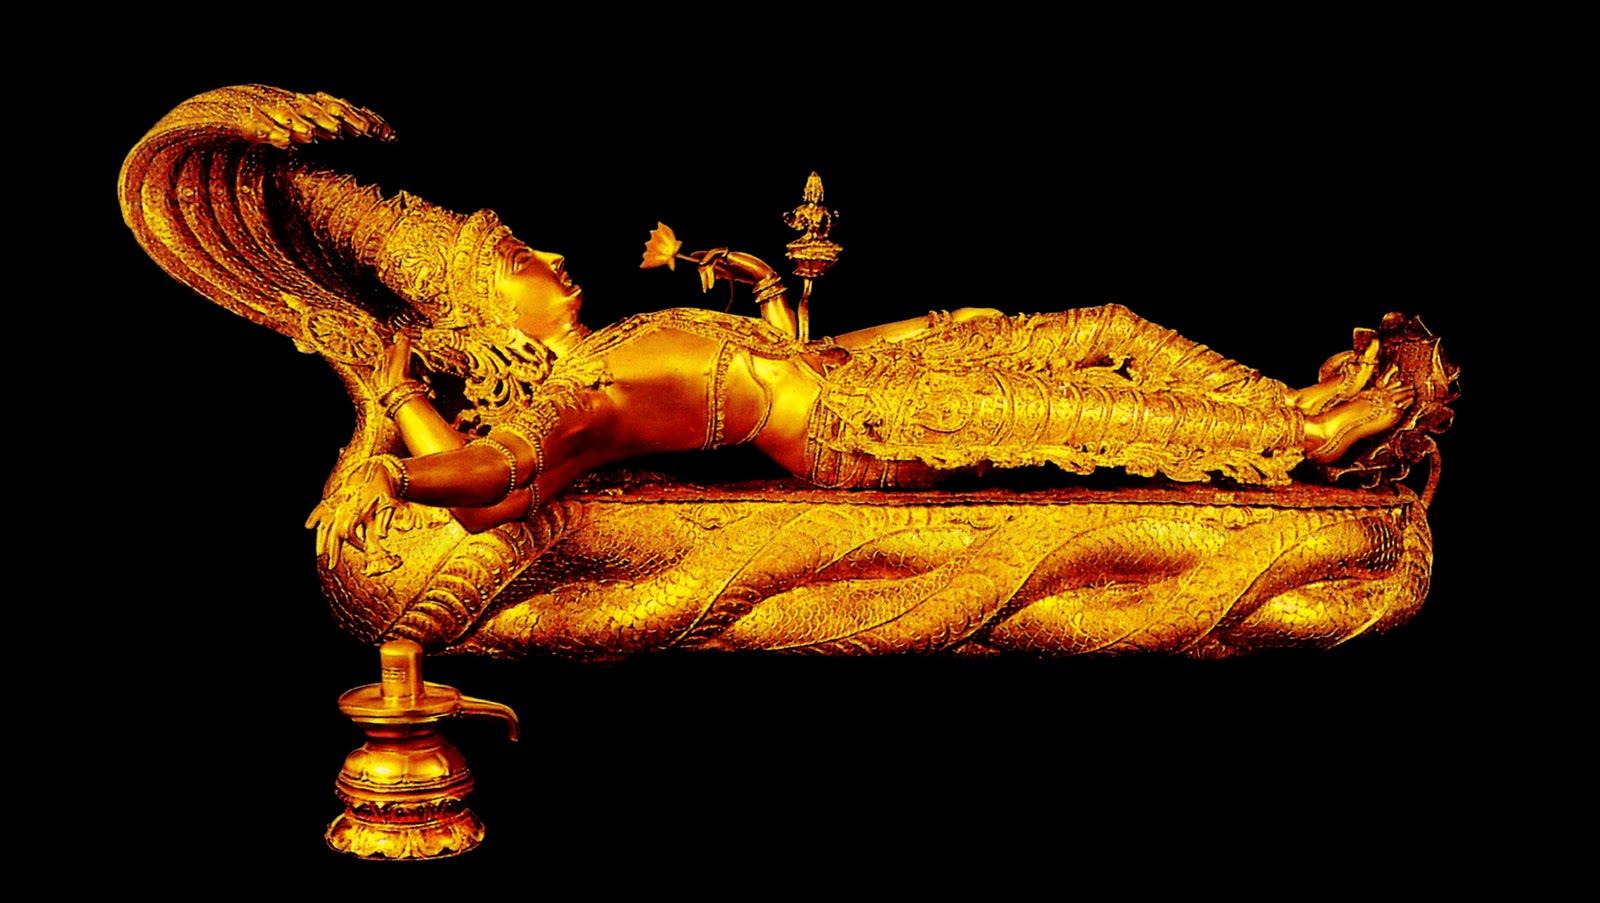 http://2.bp.blogspot.com/-epHaJGaBJOs/ThMzdvt1RVI/AAAAAAAAAh8/G1RDNGXhzDw/s1600/Gold+statue+of+Lord+Vishnu.jpg